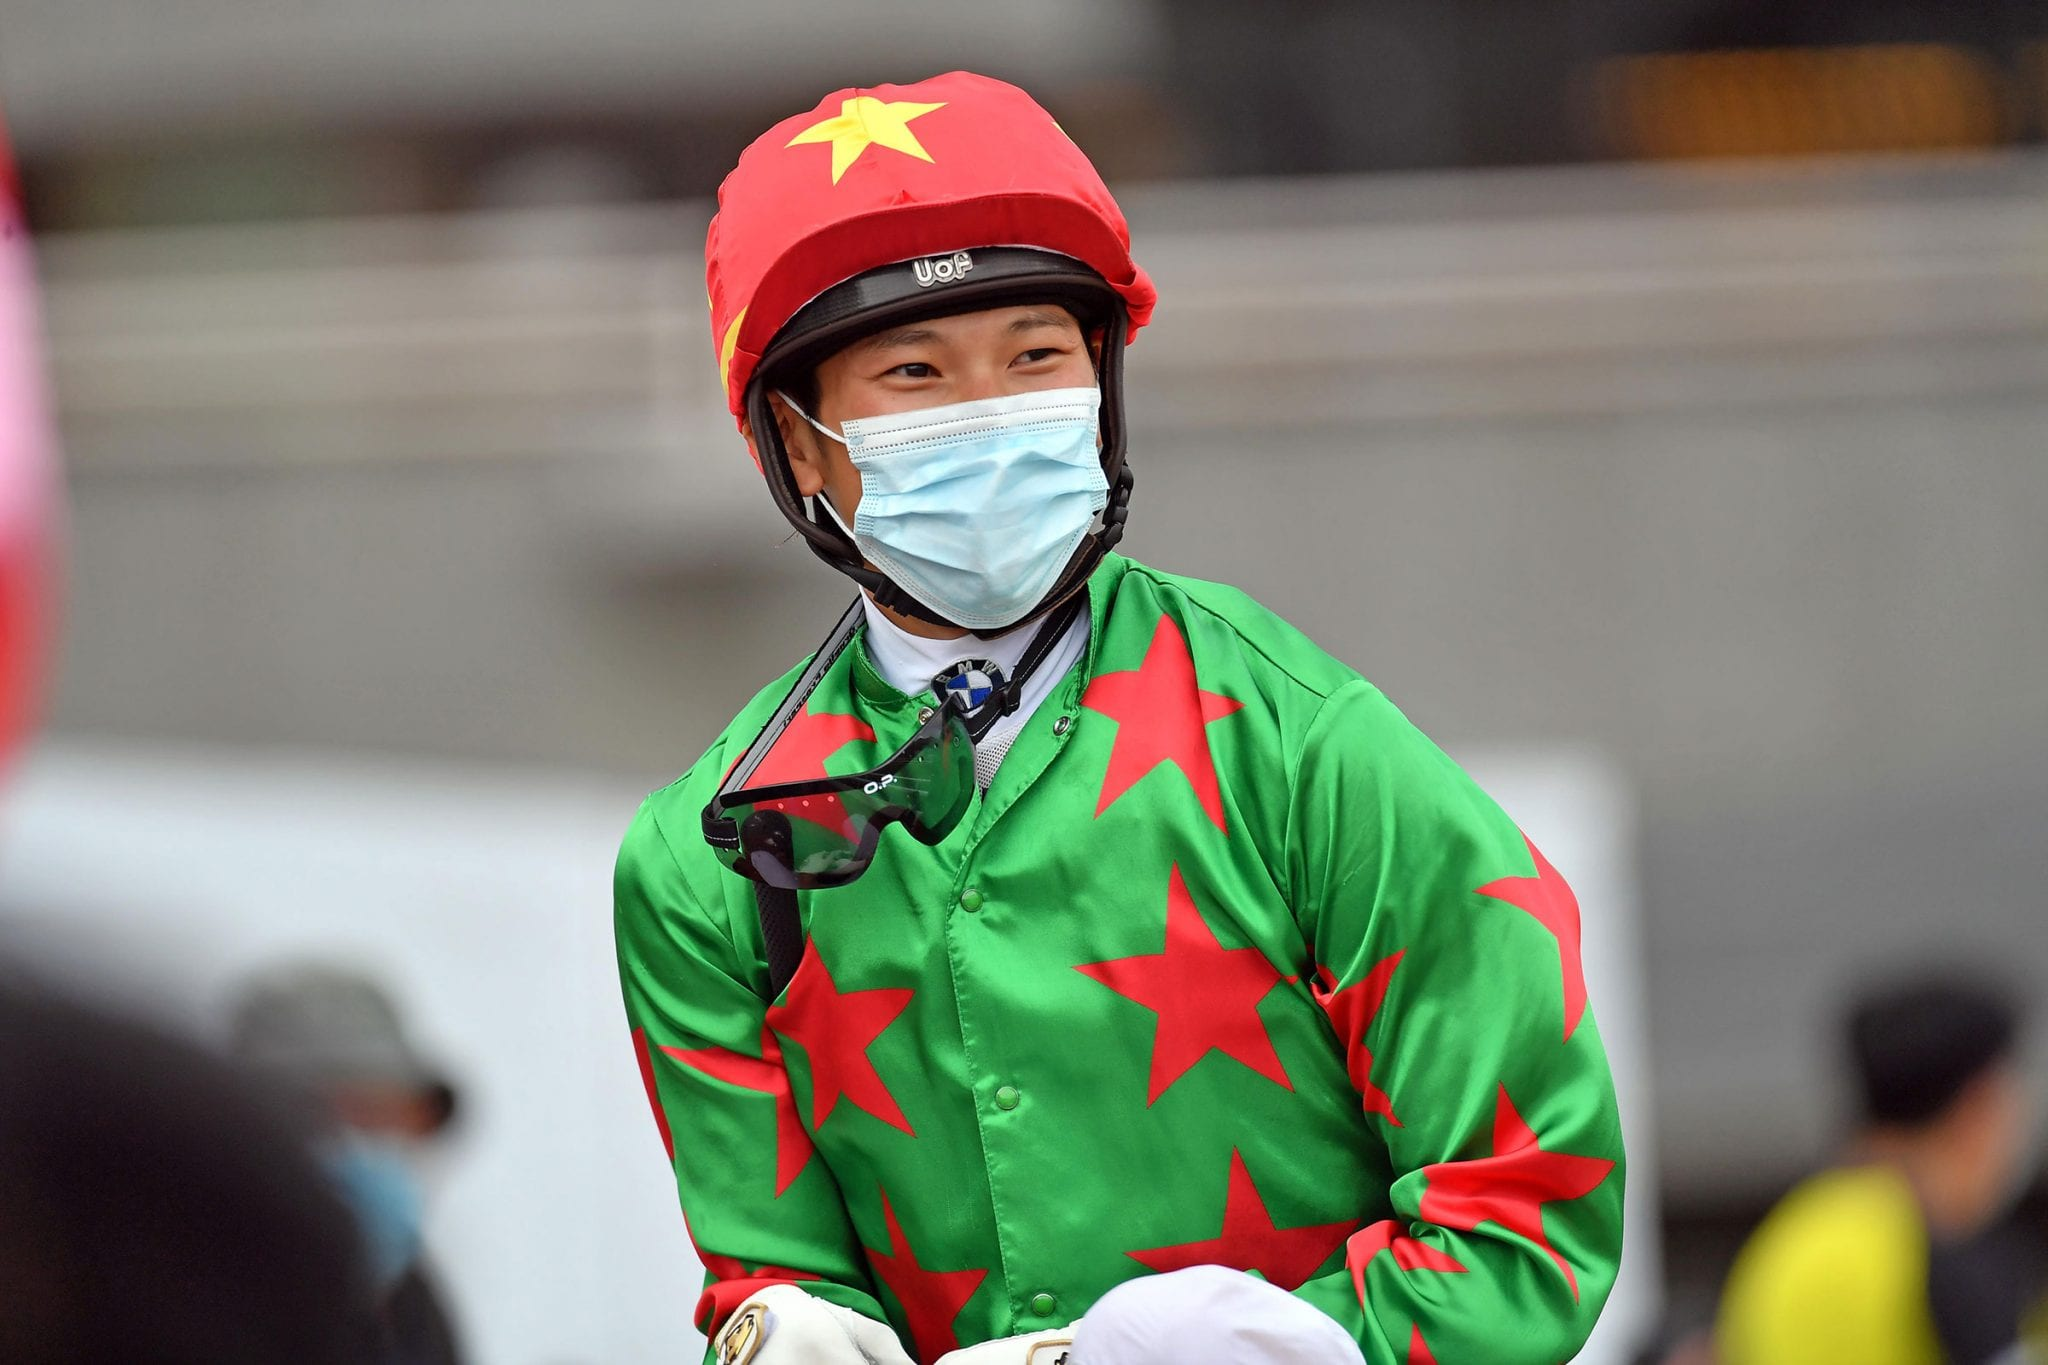 Jerry Chau